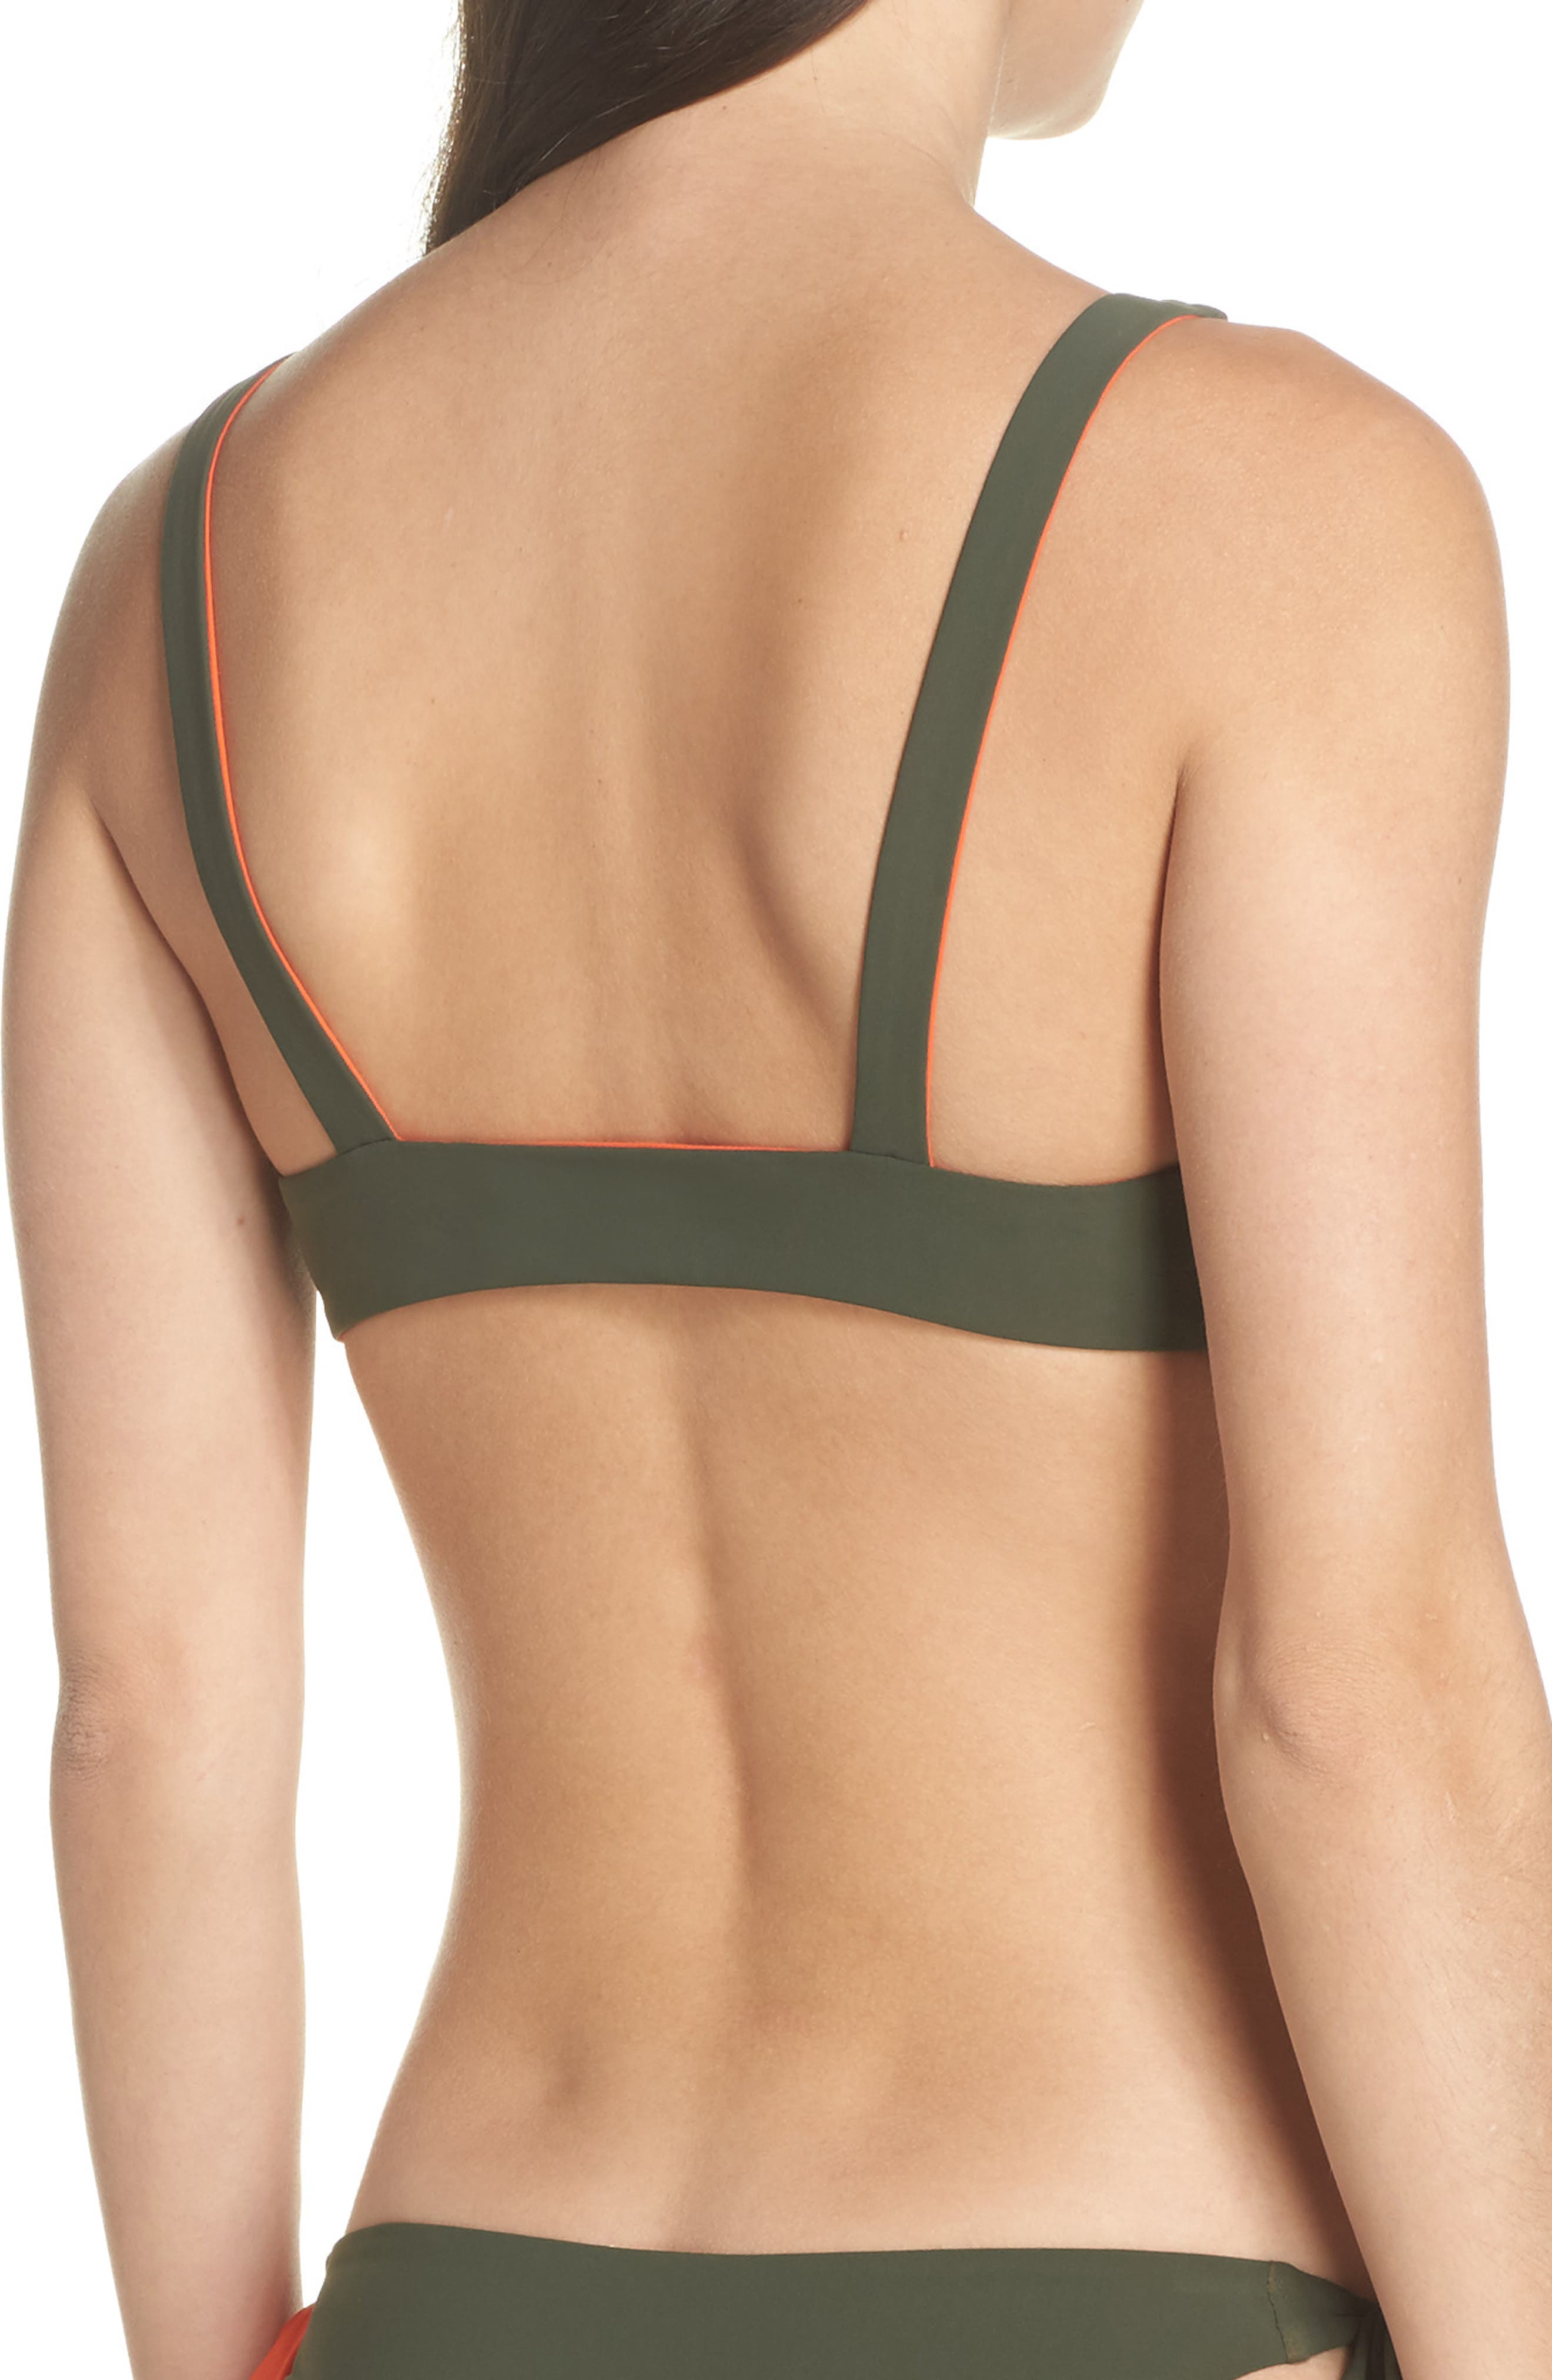 Biarritz Reversible Bikini Top,                             Alternate thumbnail 3, color,                             Green Olive/ Sweet Tangerine